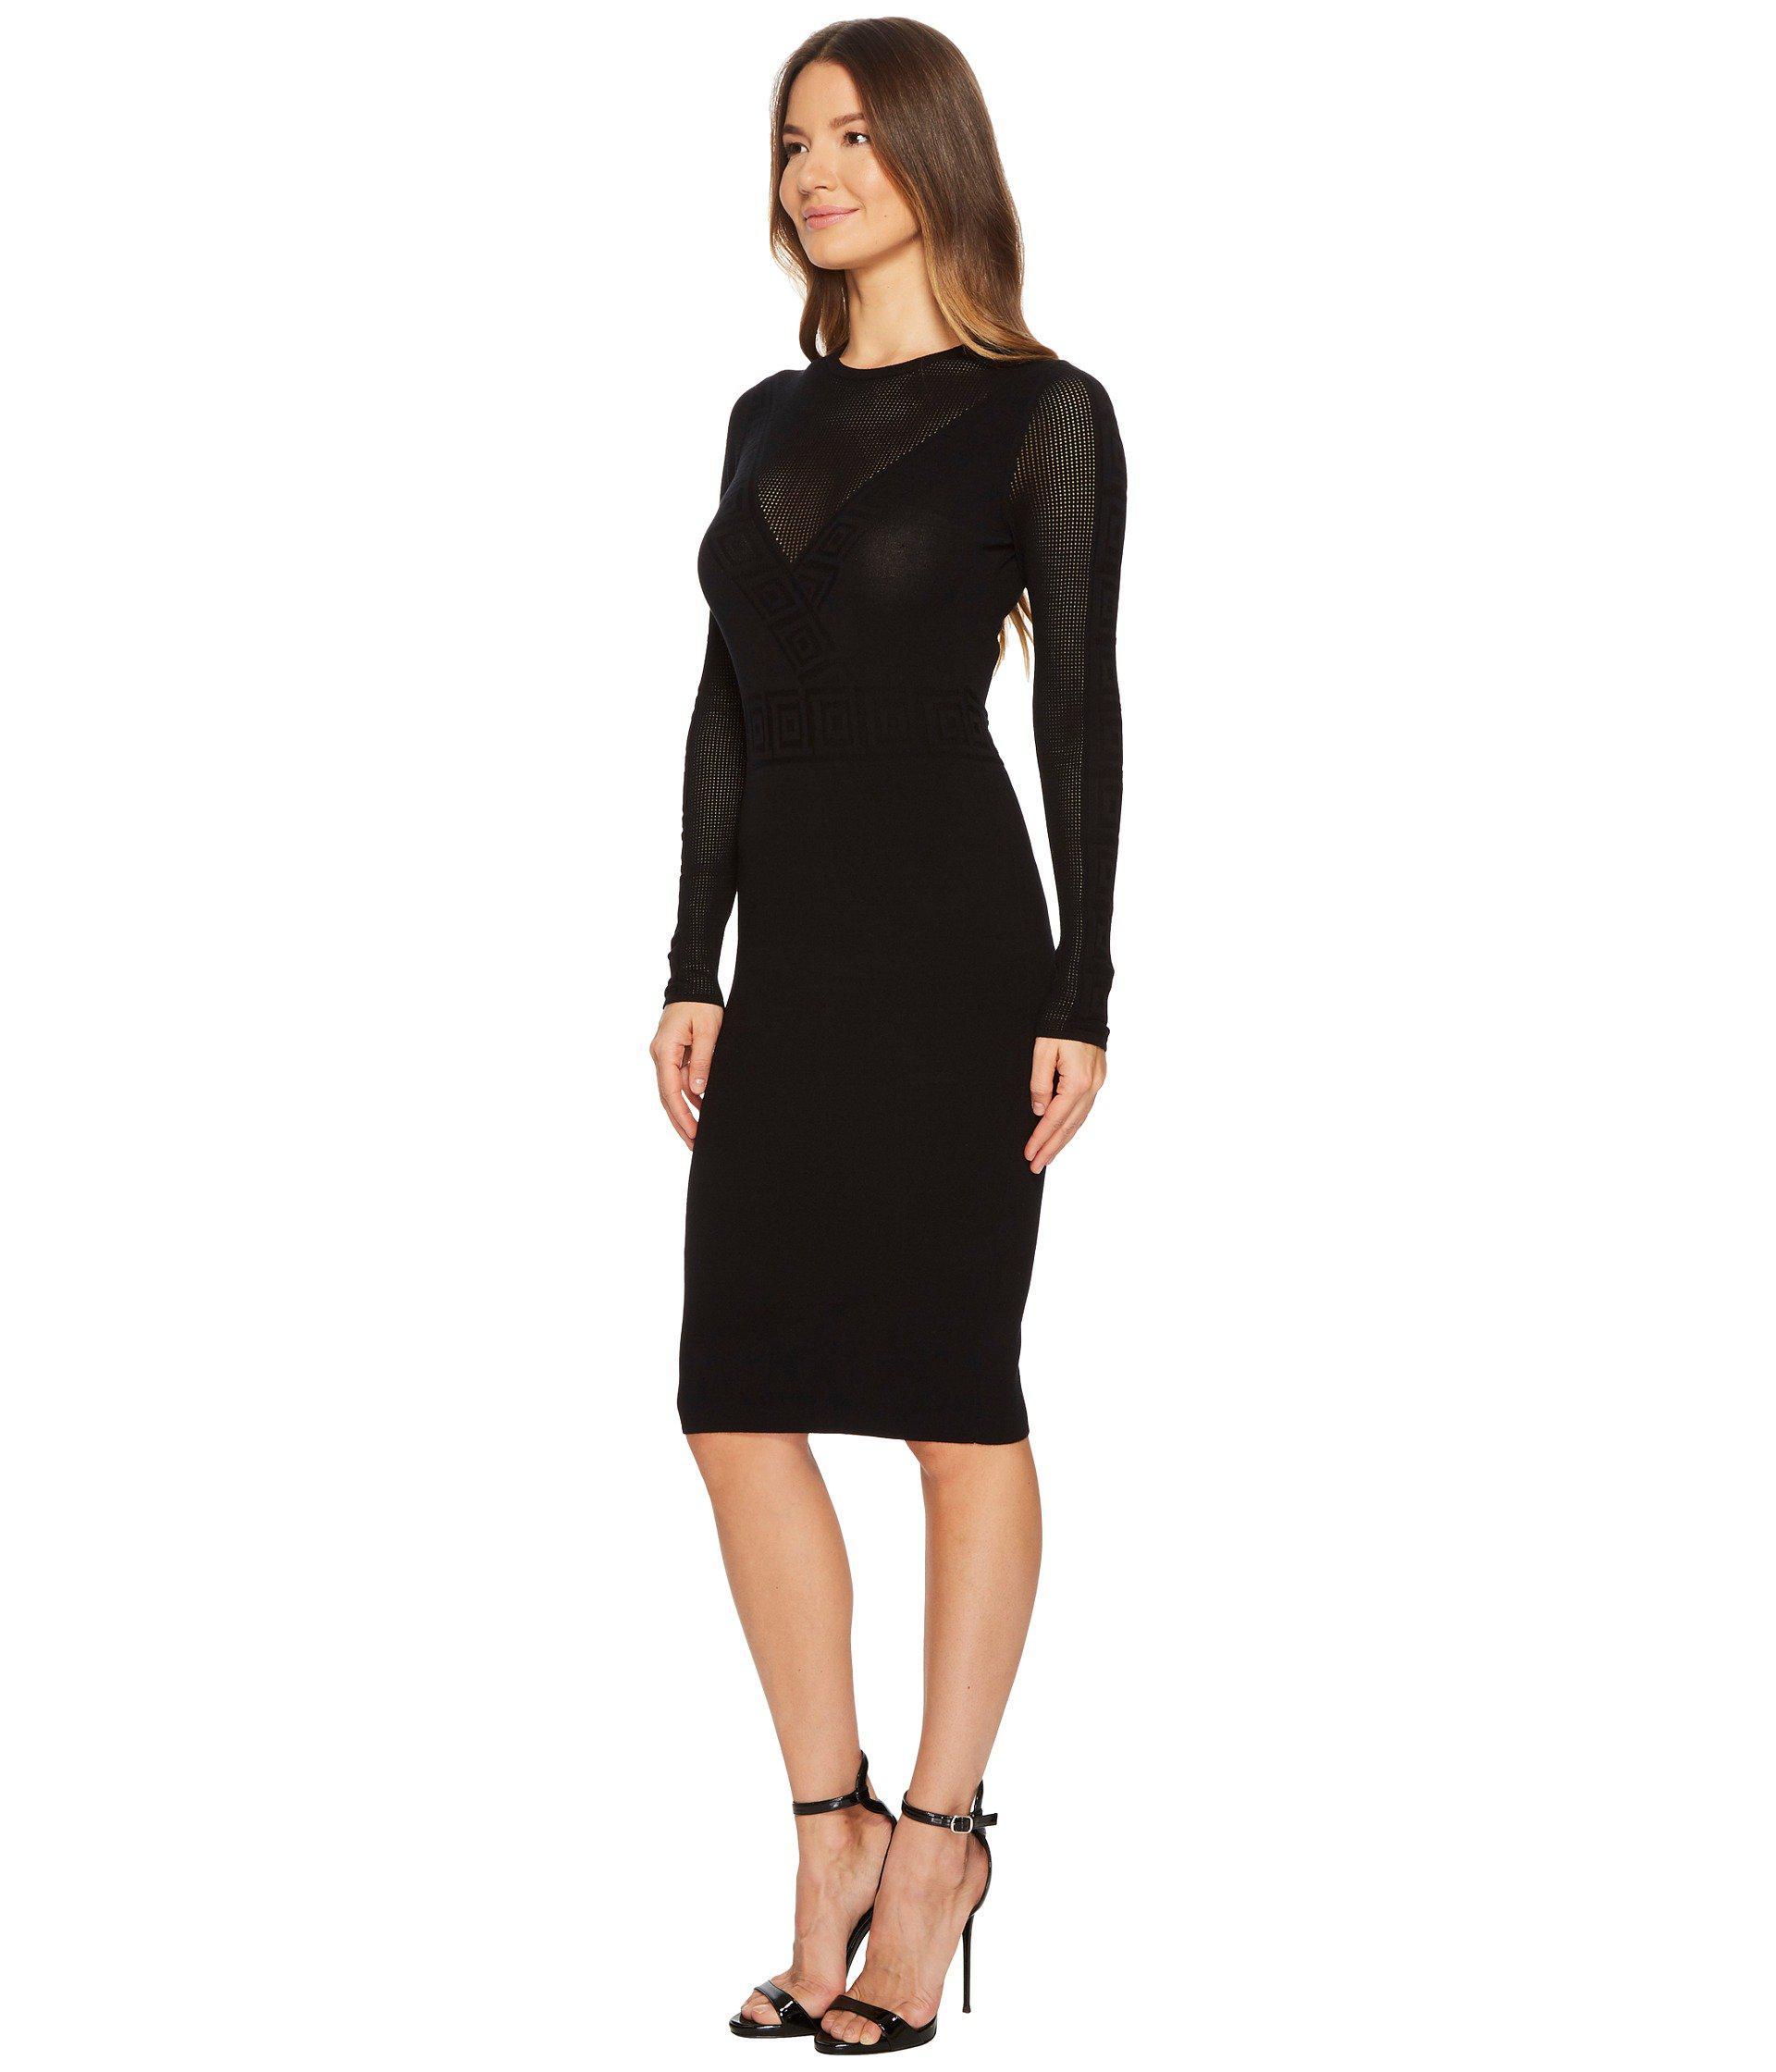 5d67e9b5b5dd Versace Abito Maglia Donna Long Sleeve Dress in Black - Lyst